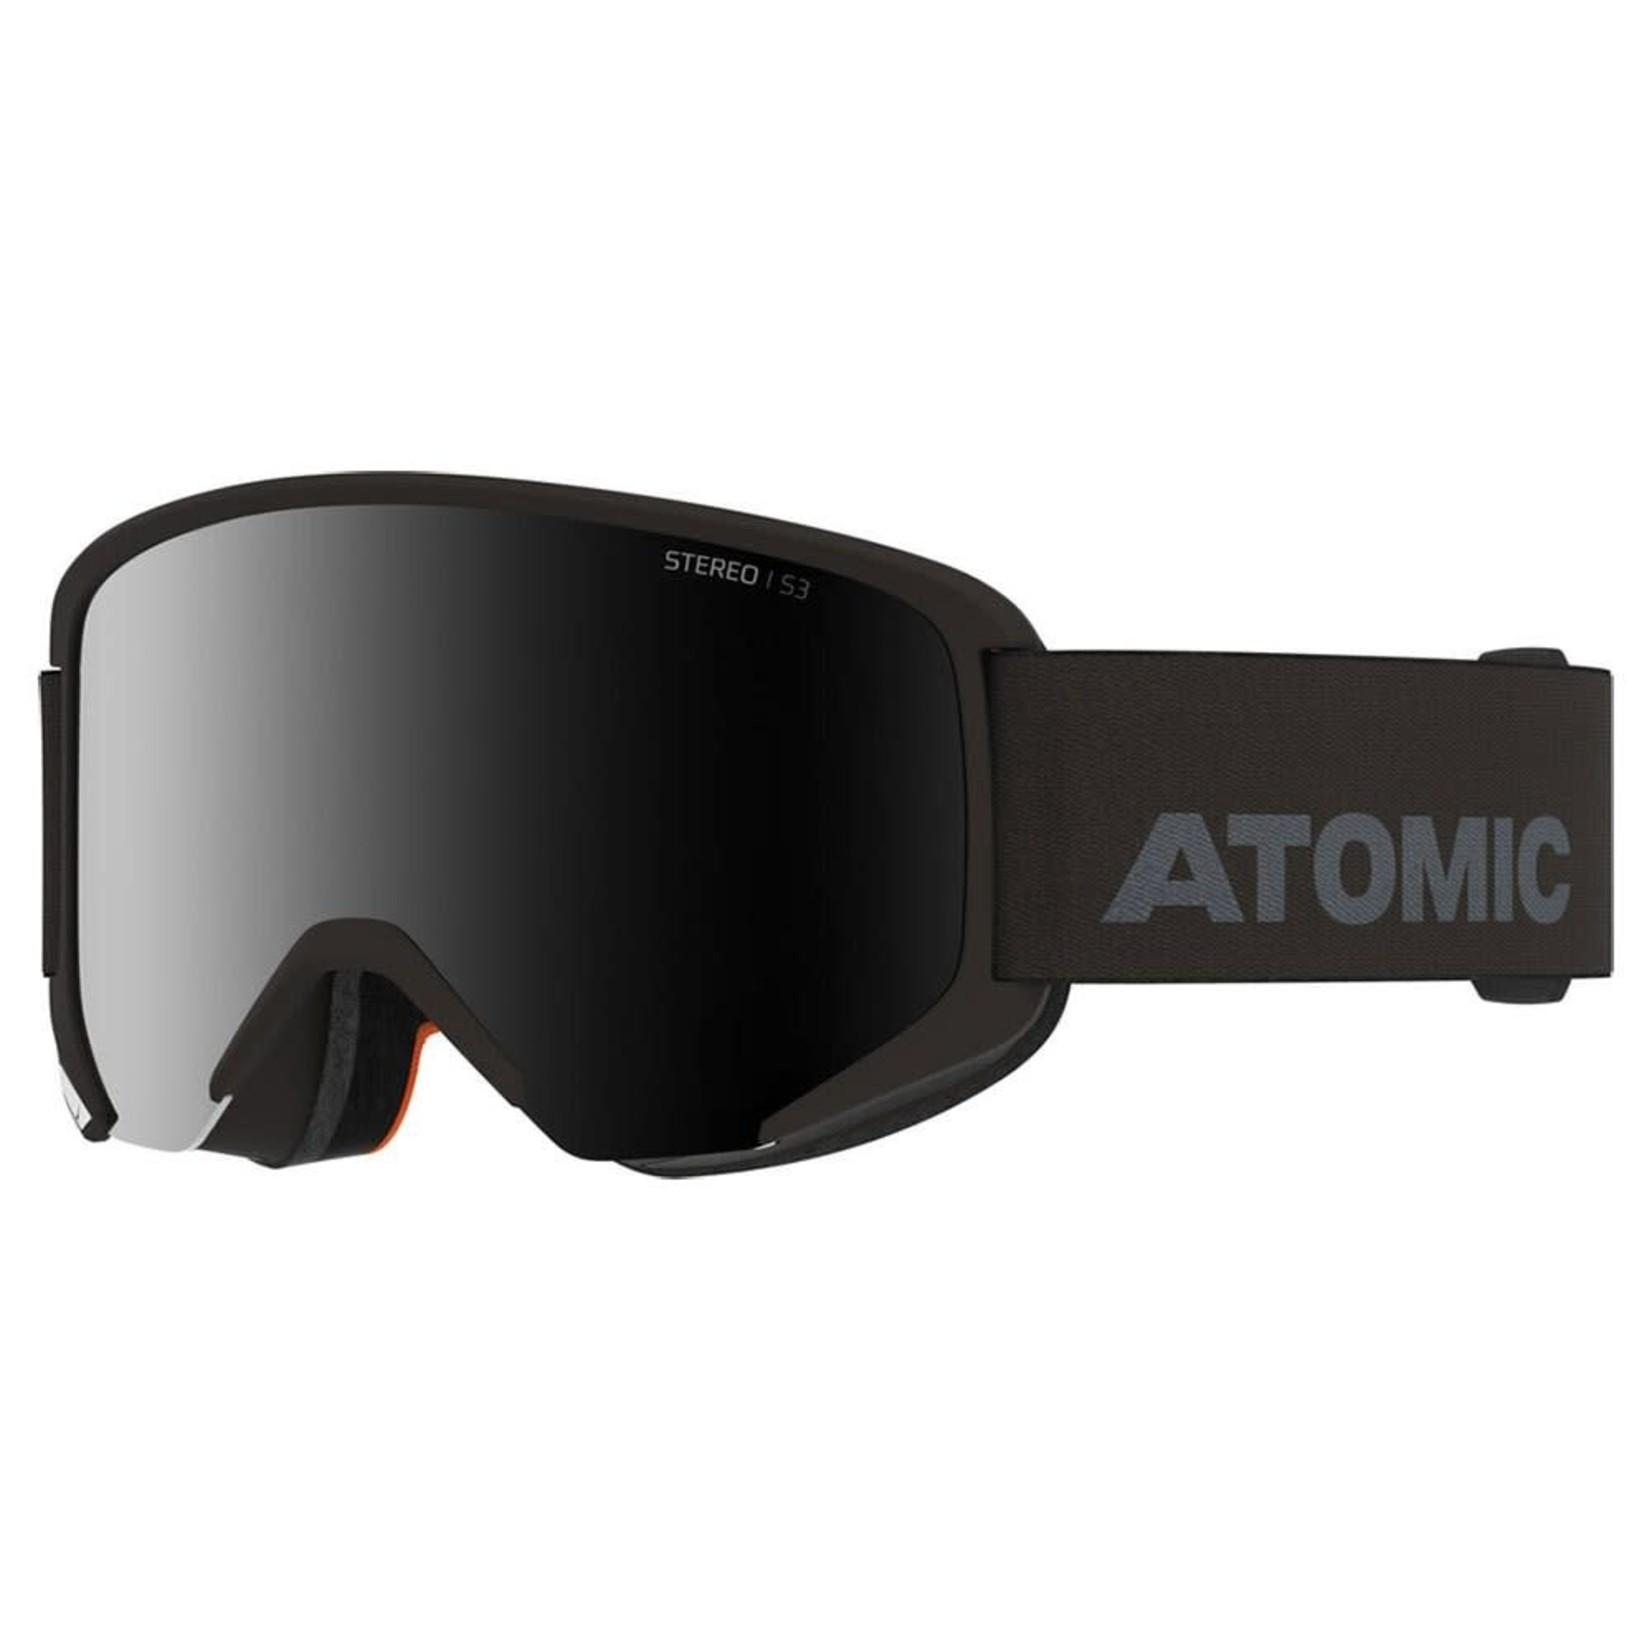 Atomic Lunette de ski Atomic Savor Stereo - Unisexe